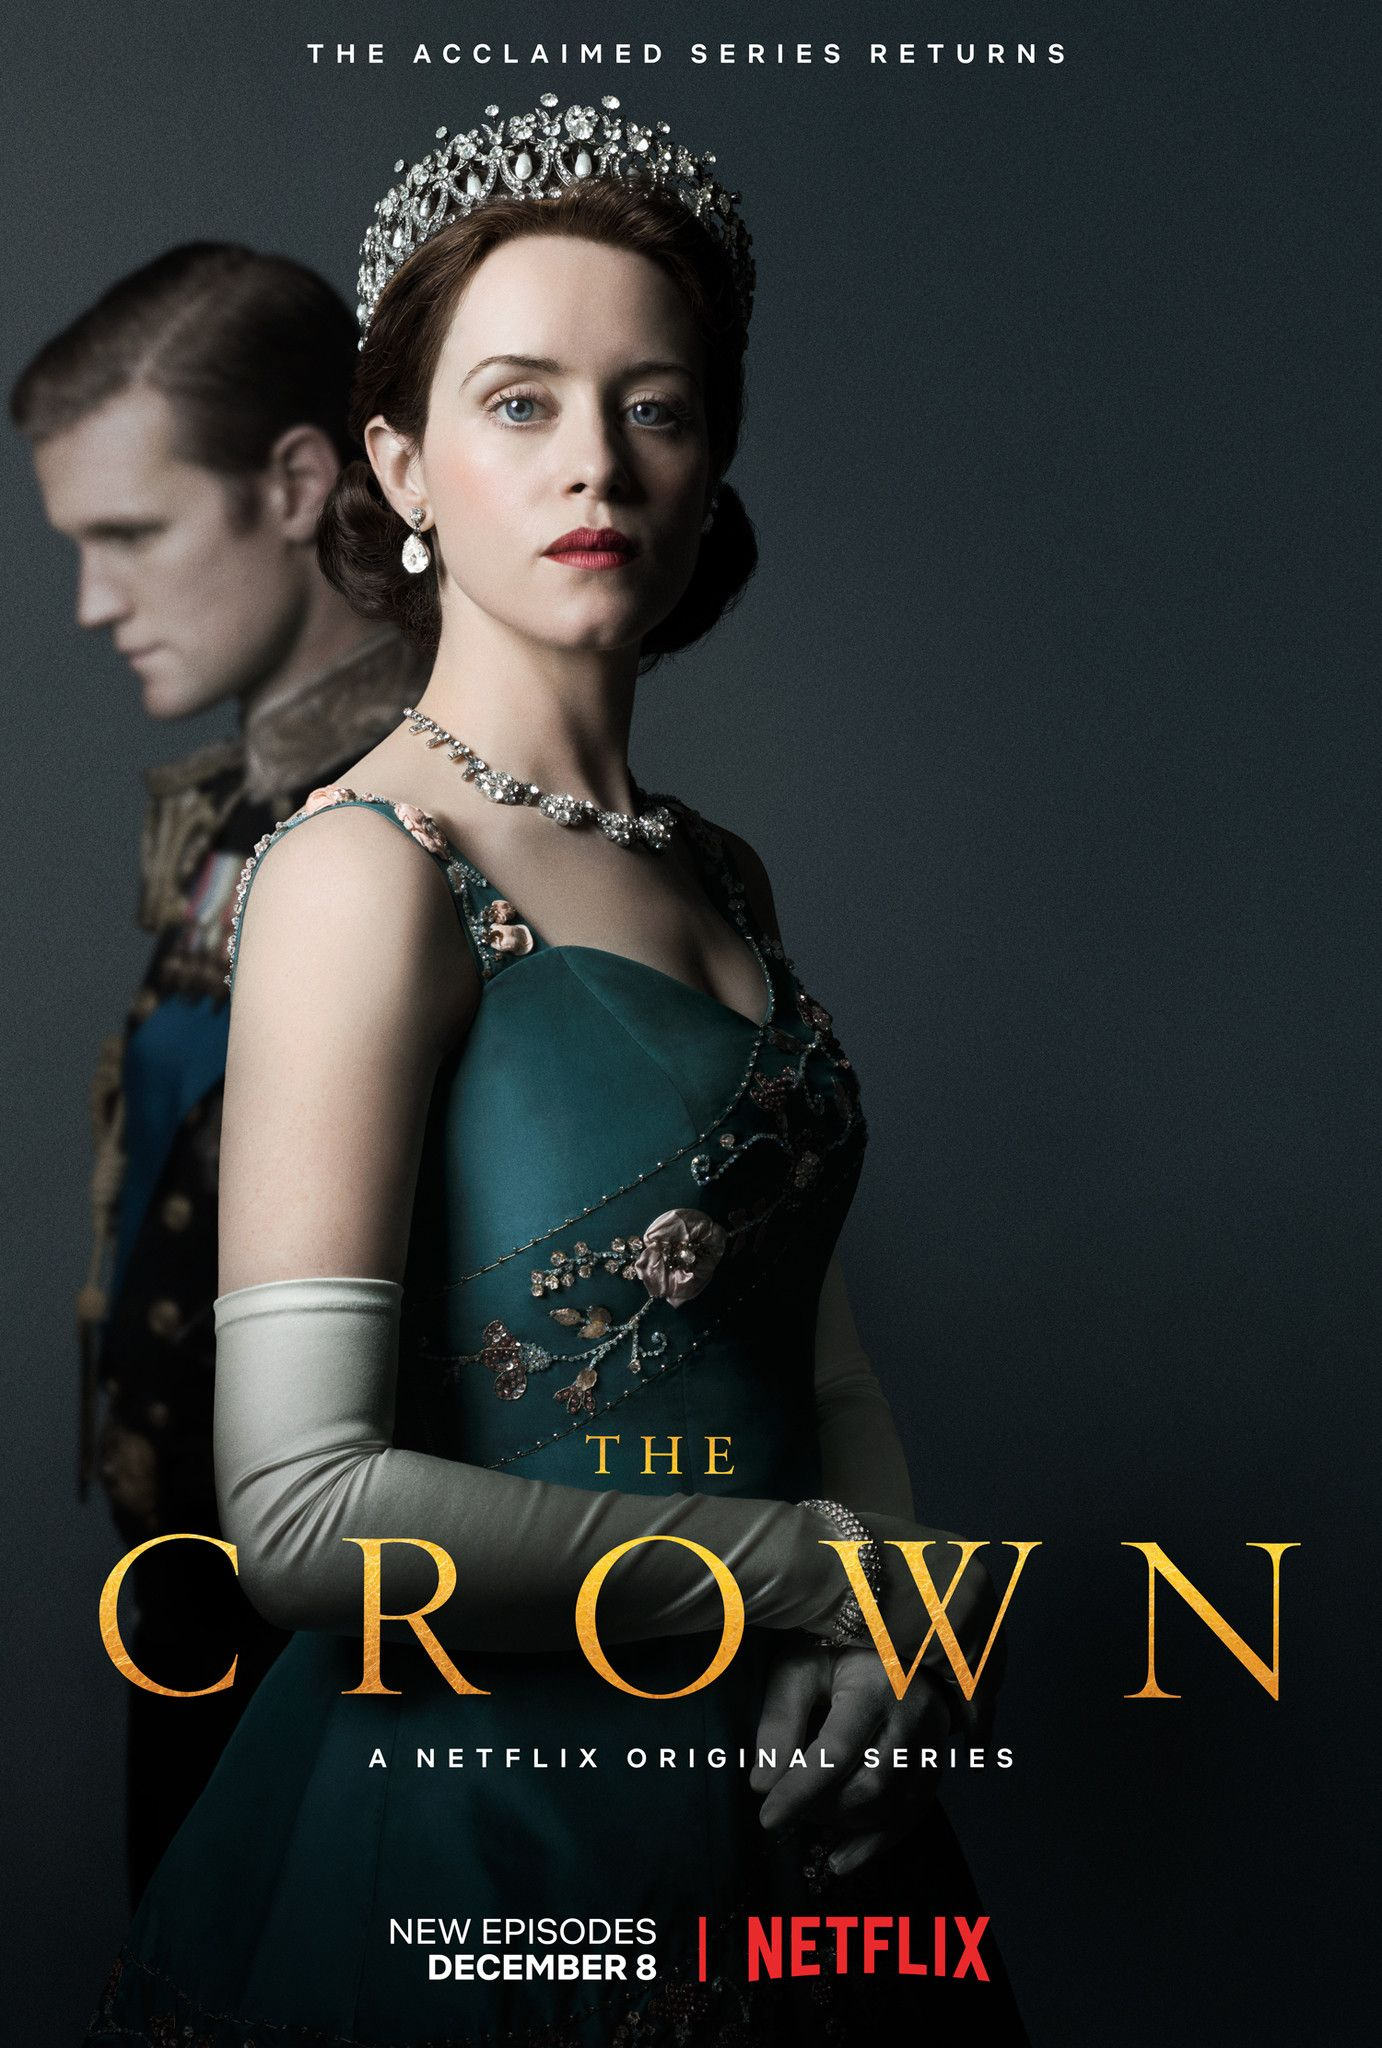 The Crown' | The crown season, Crown tv, The crown season 2